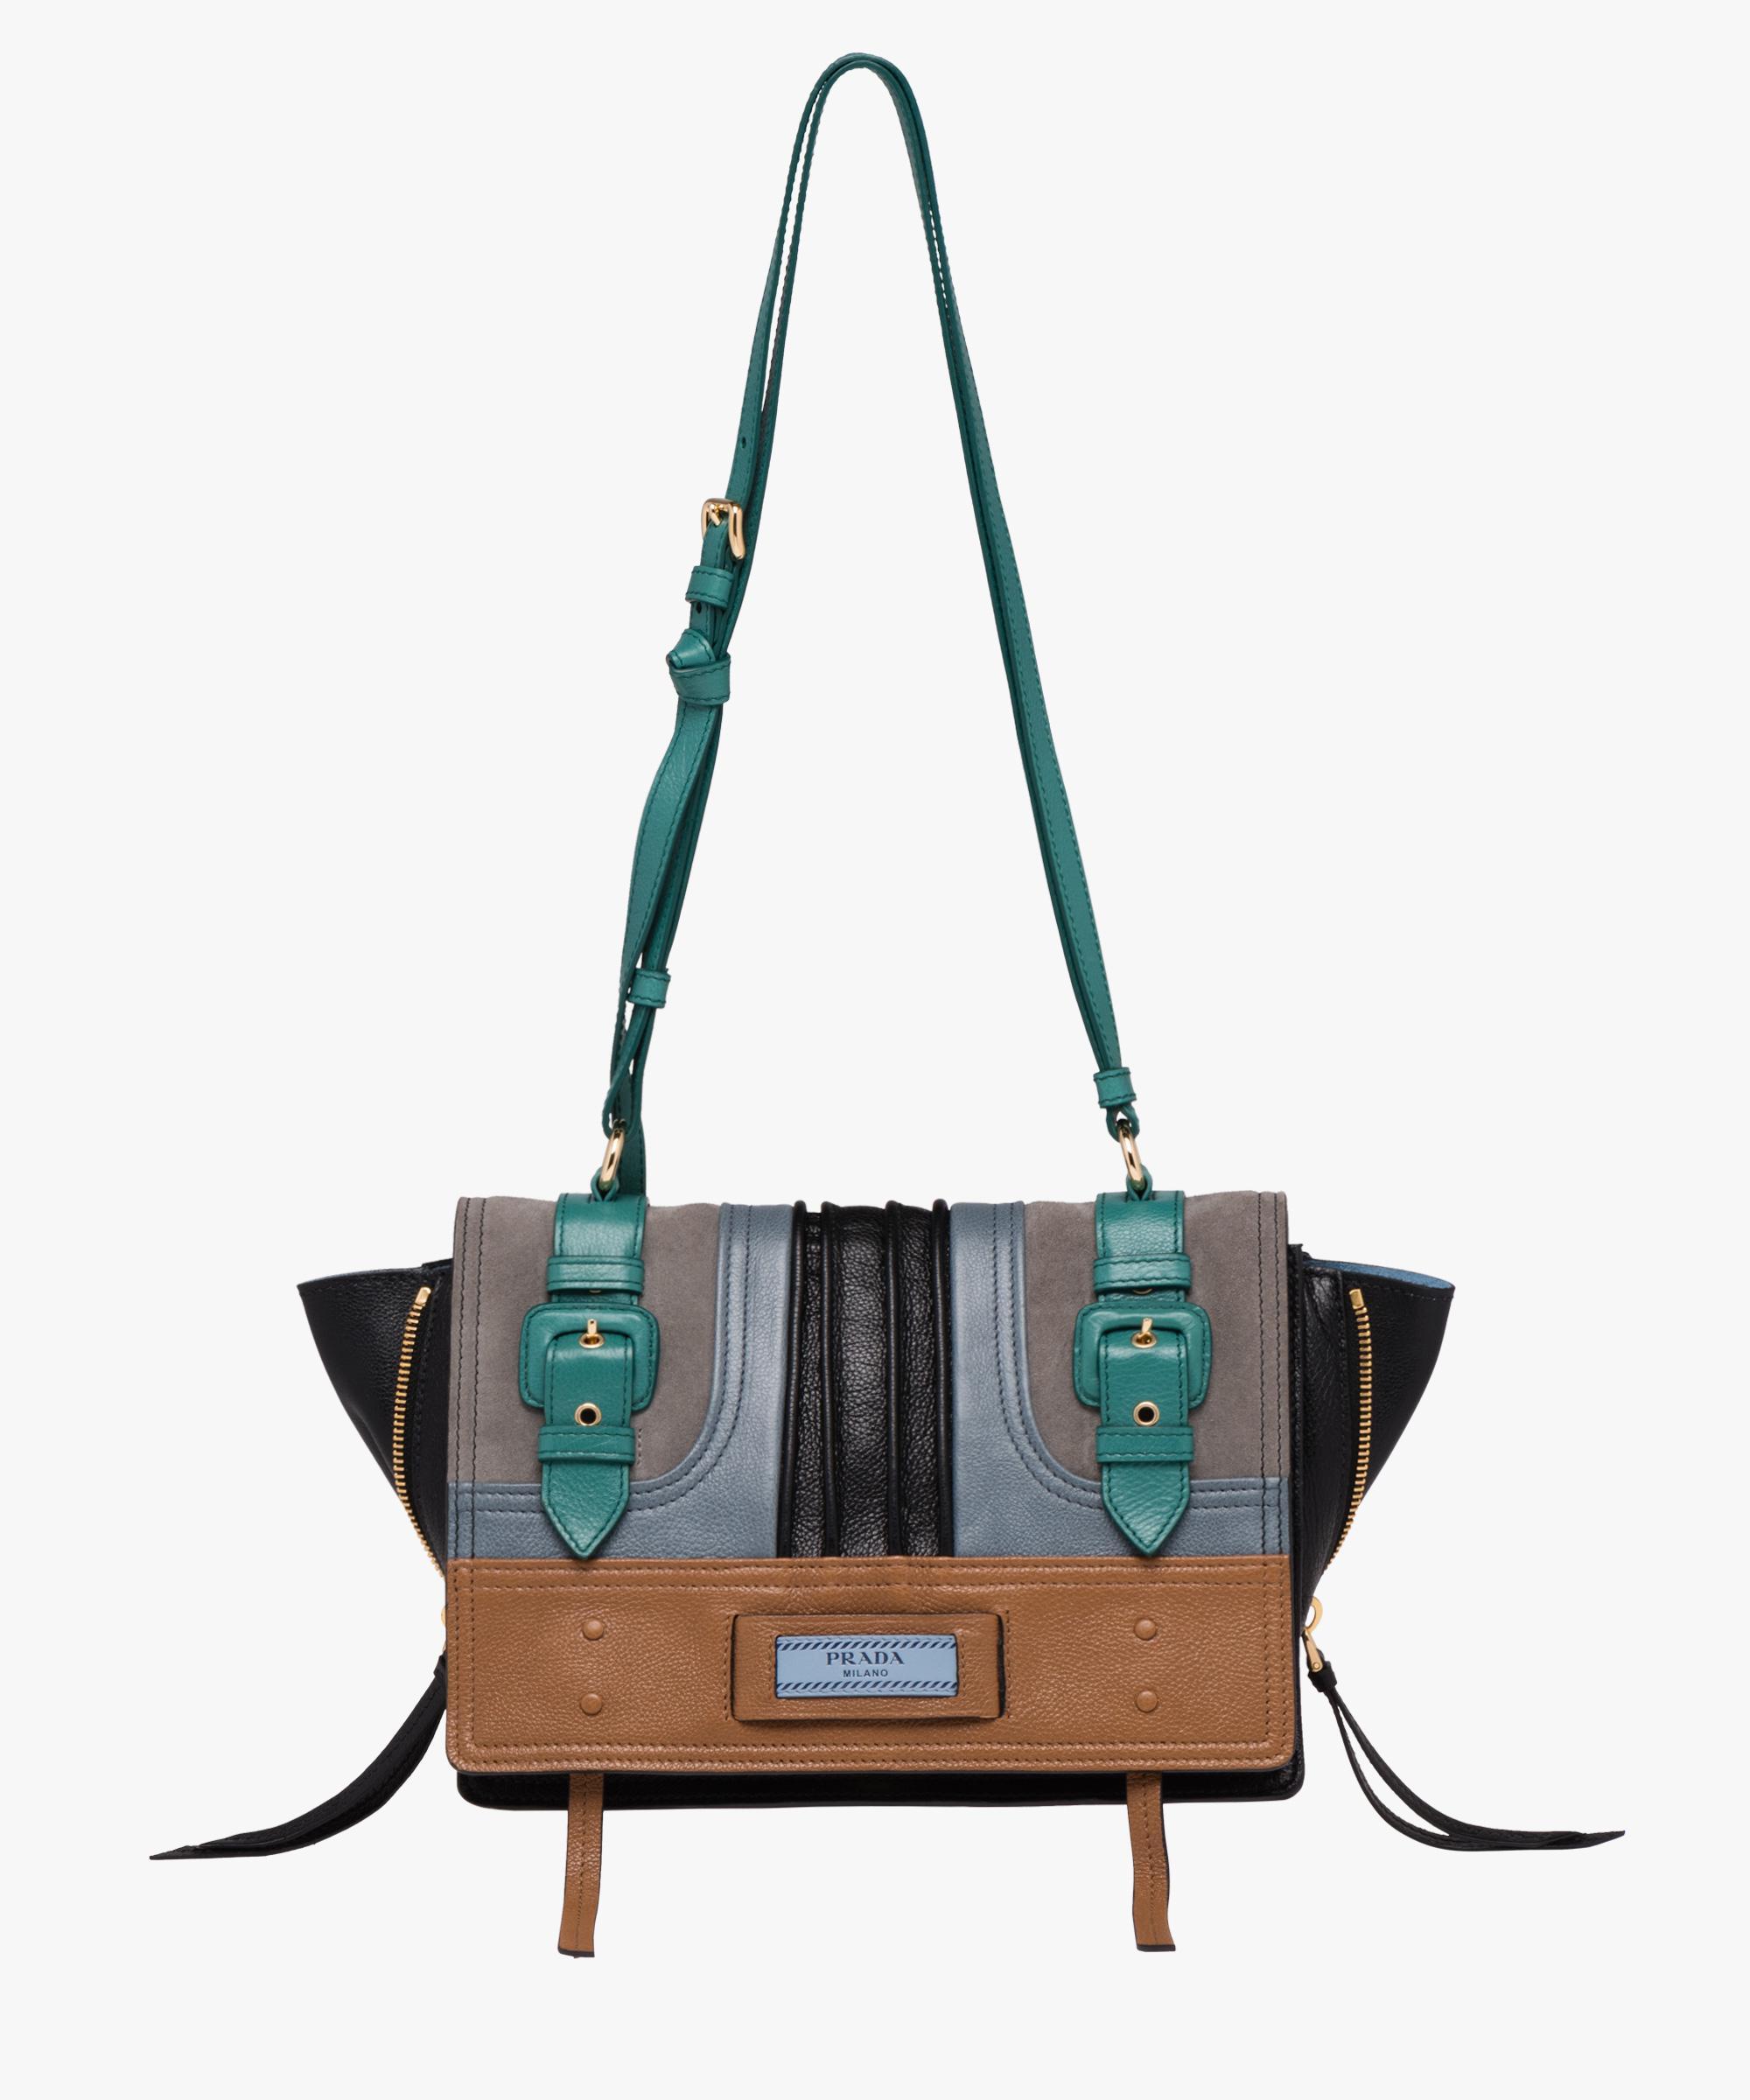 4c7838cb19d0 Lyst - Prada Etiquette Bag in Blue